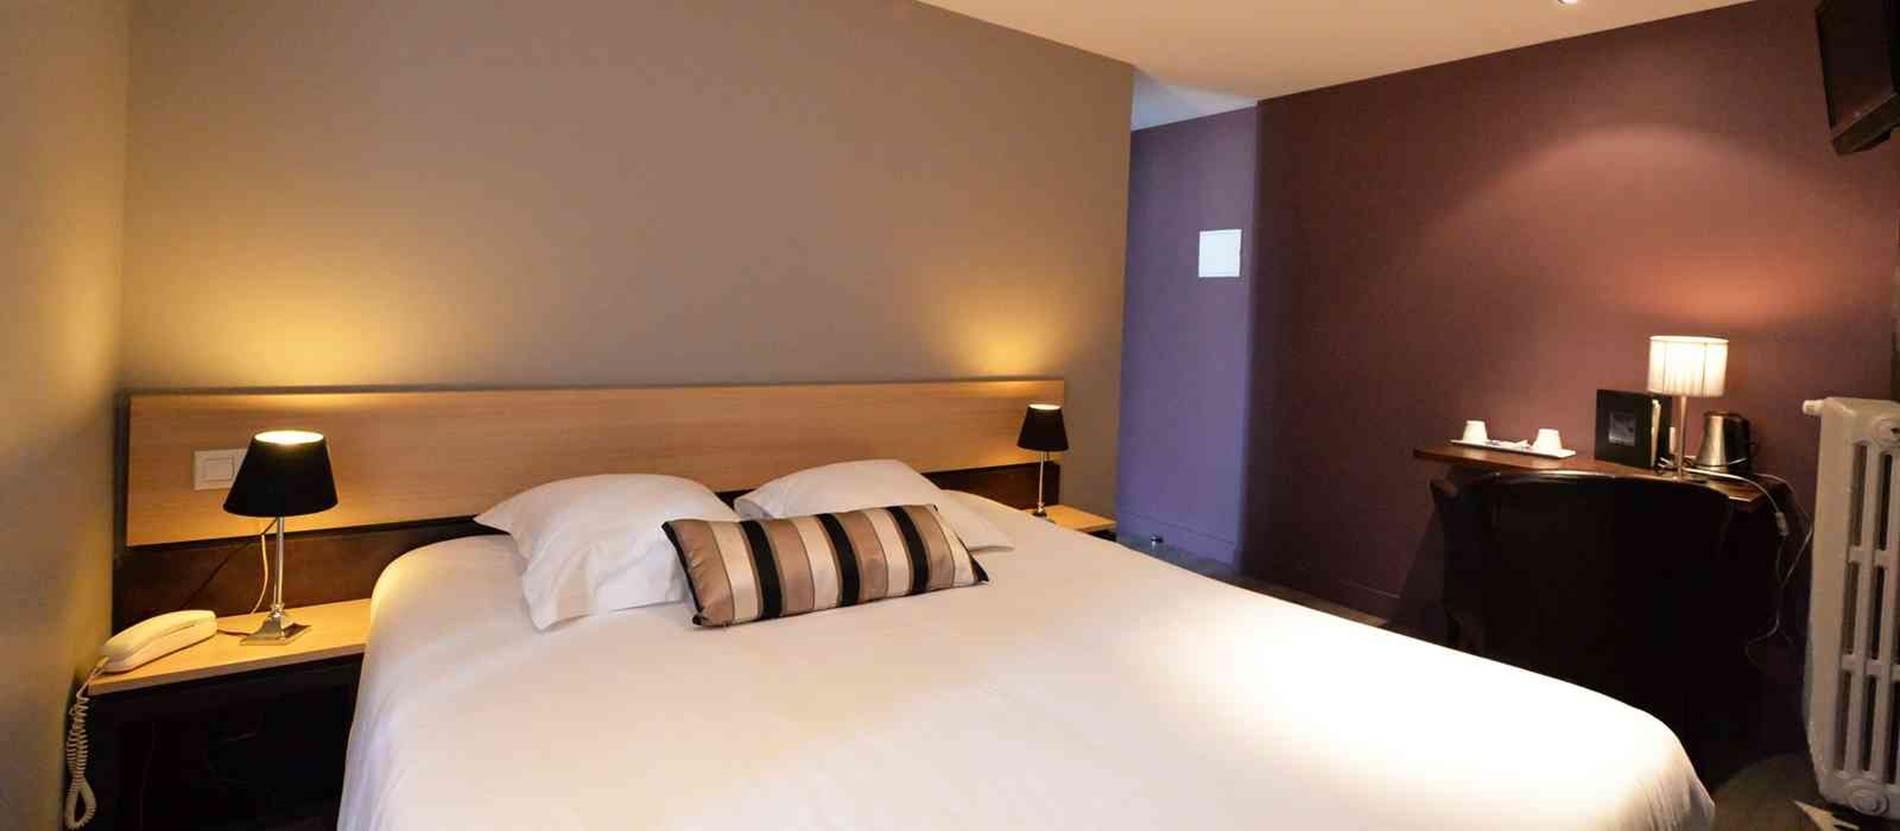 hotel-celtichotel-auray-Morbihan-Bretagne-Sud-chambre © hotel-celtichotel-auray